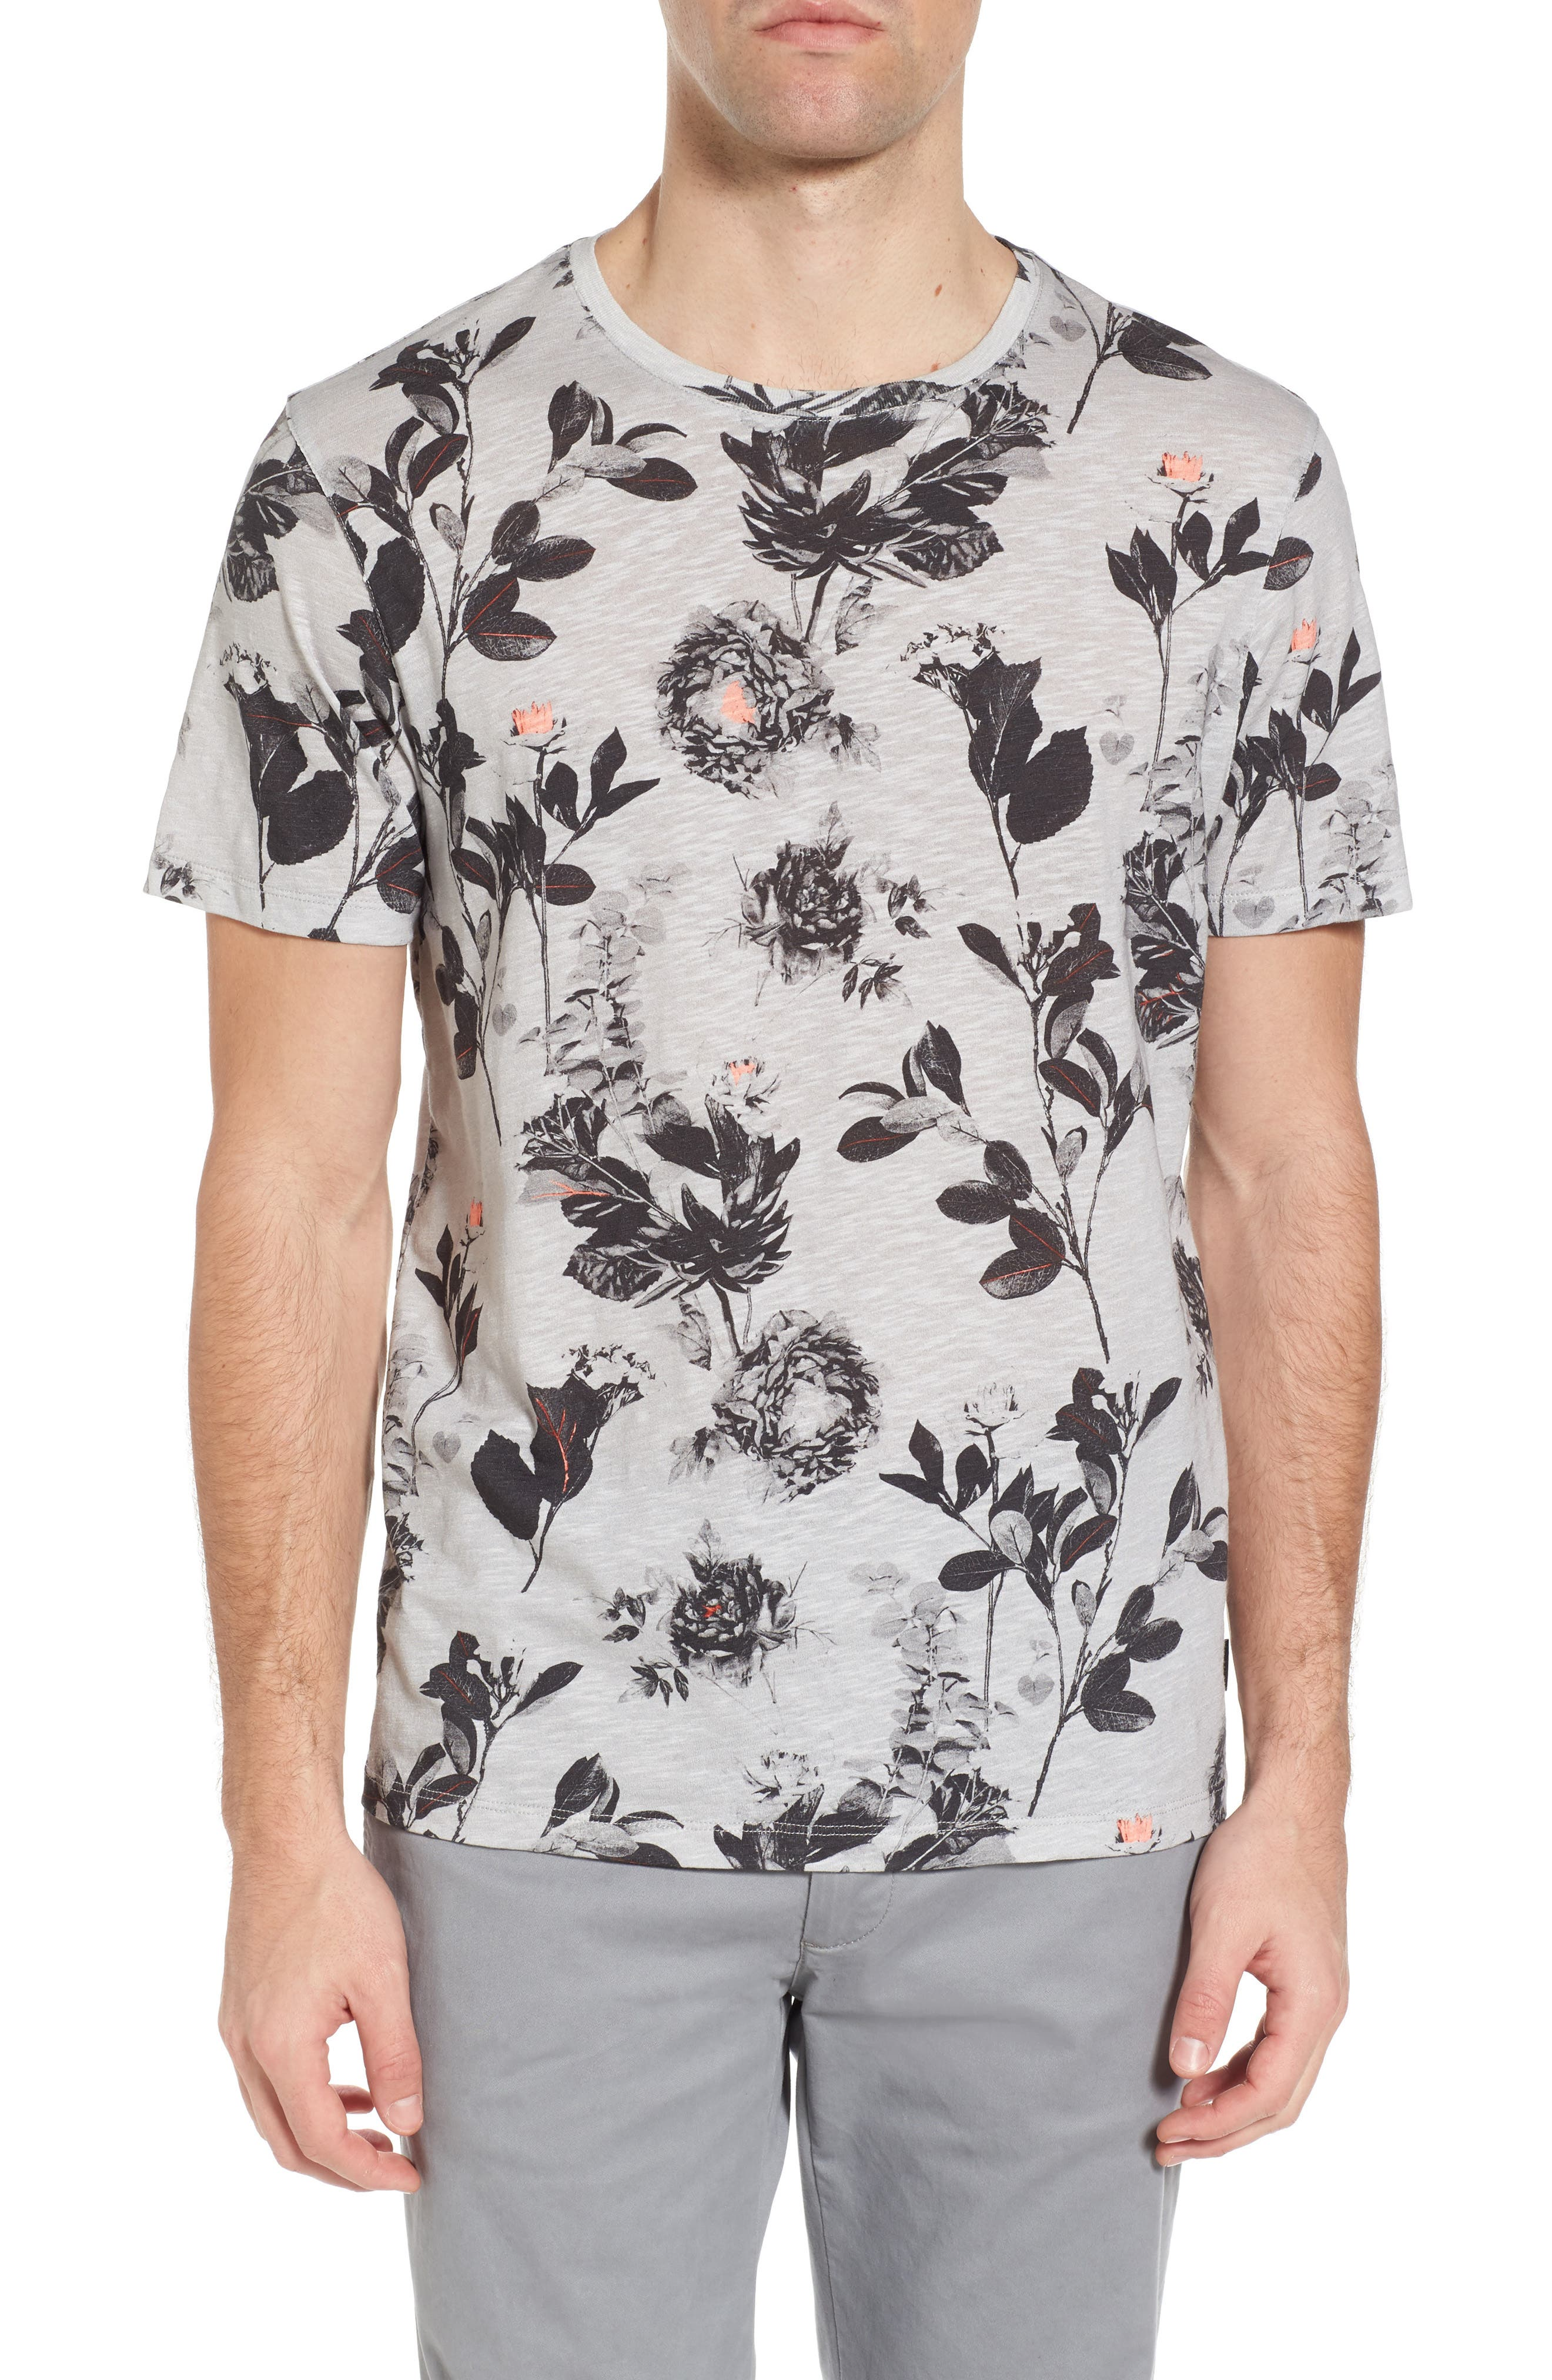 Doberma Trim Fit Floral Print T-Shirt,                             Main thumbnail 1, color,